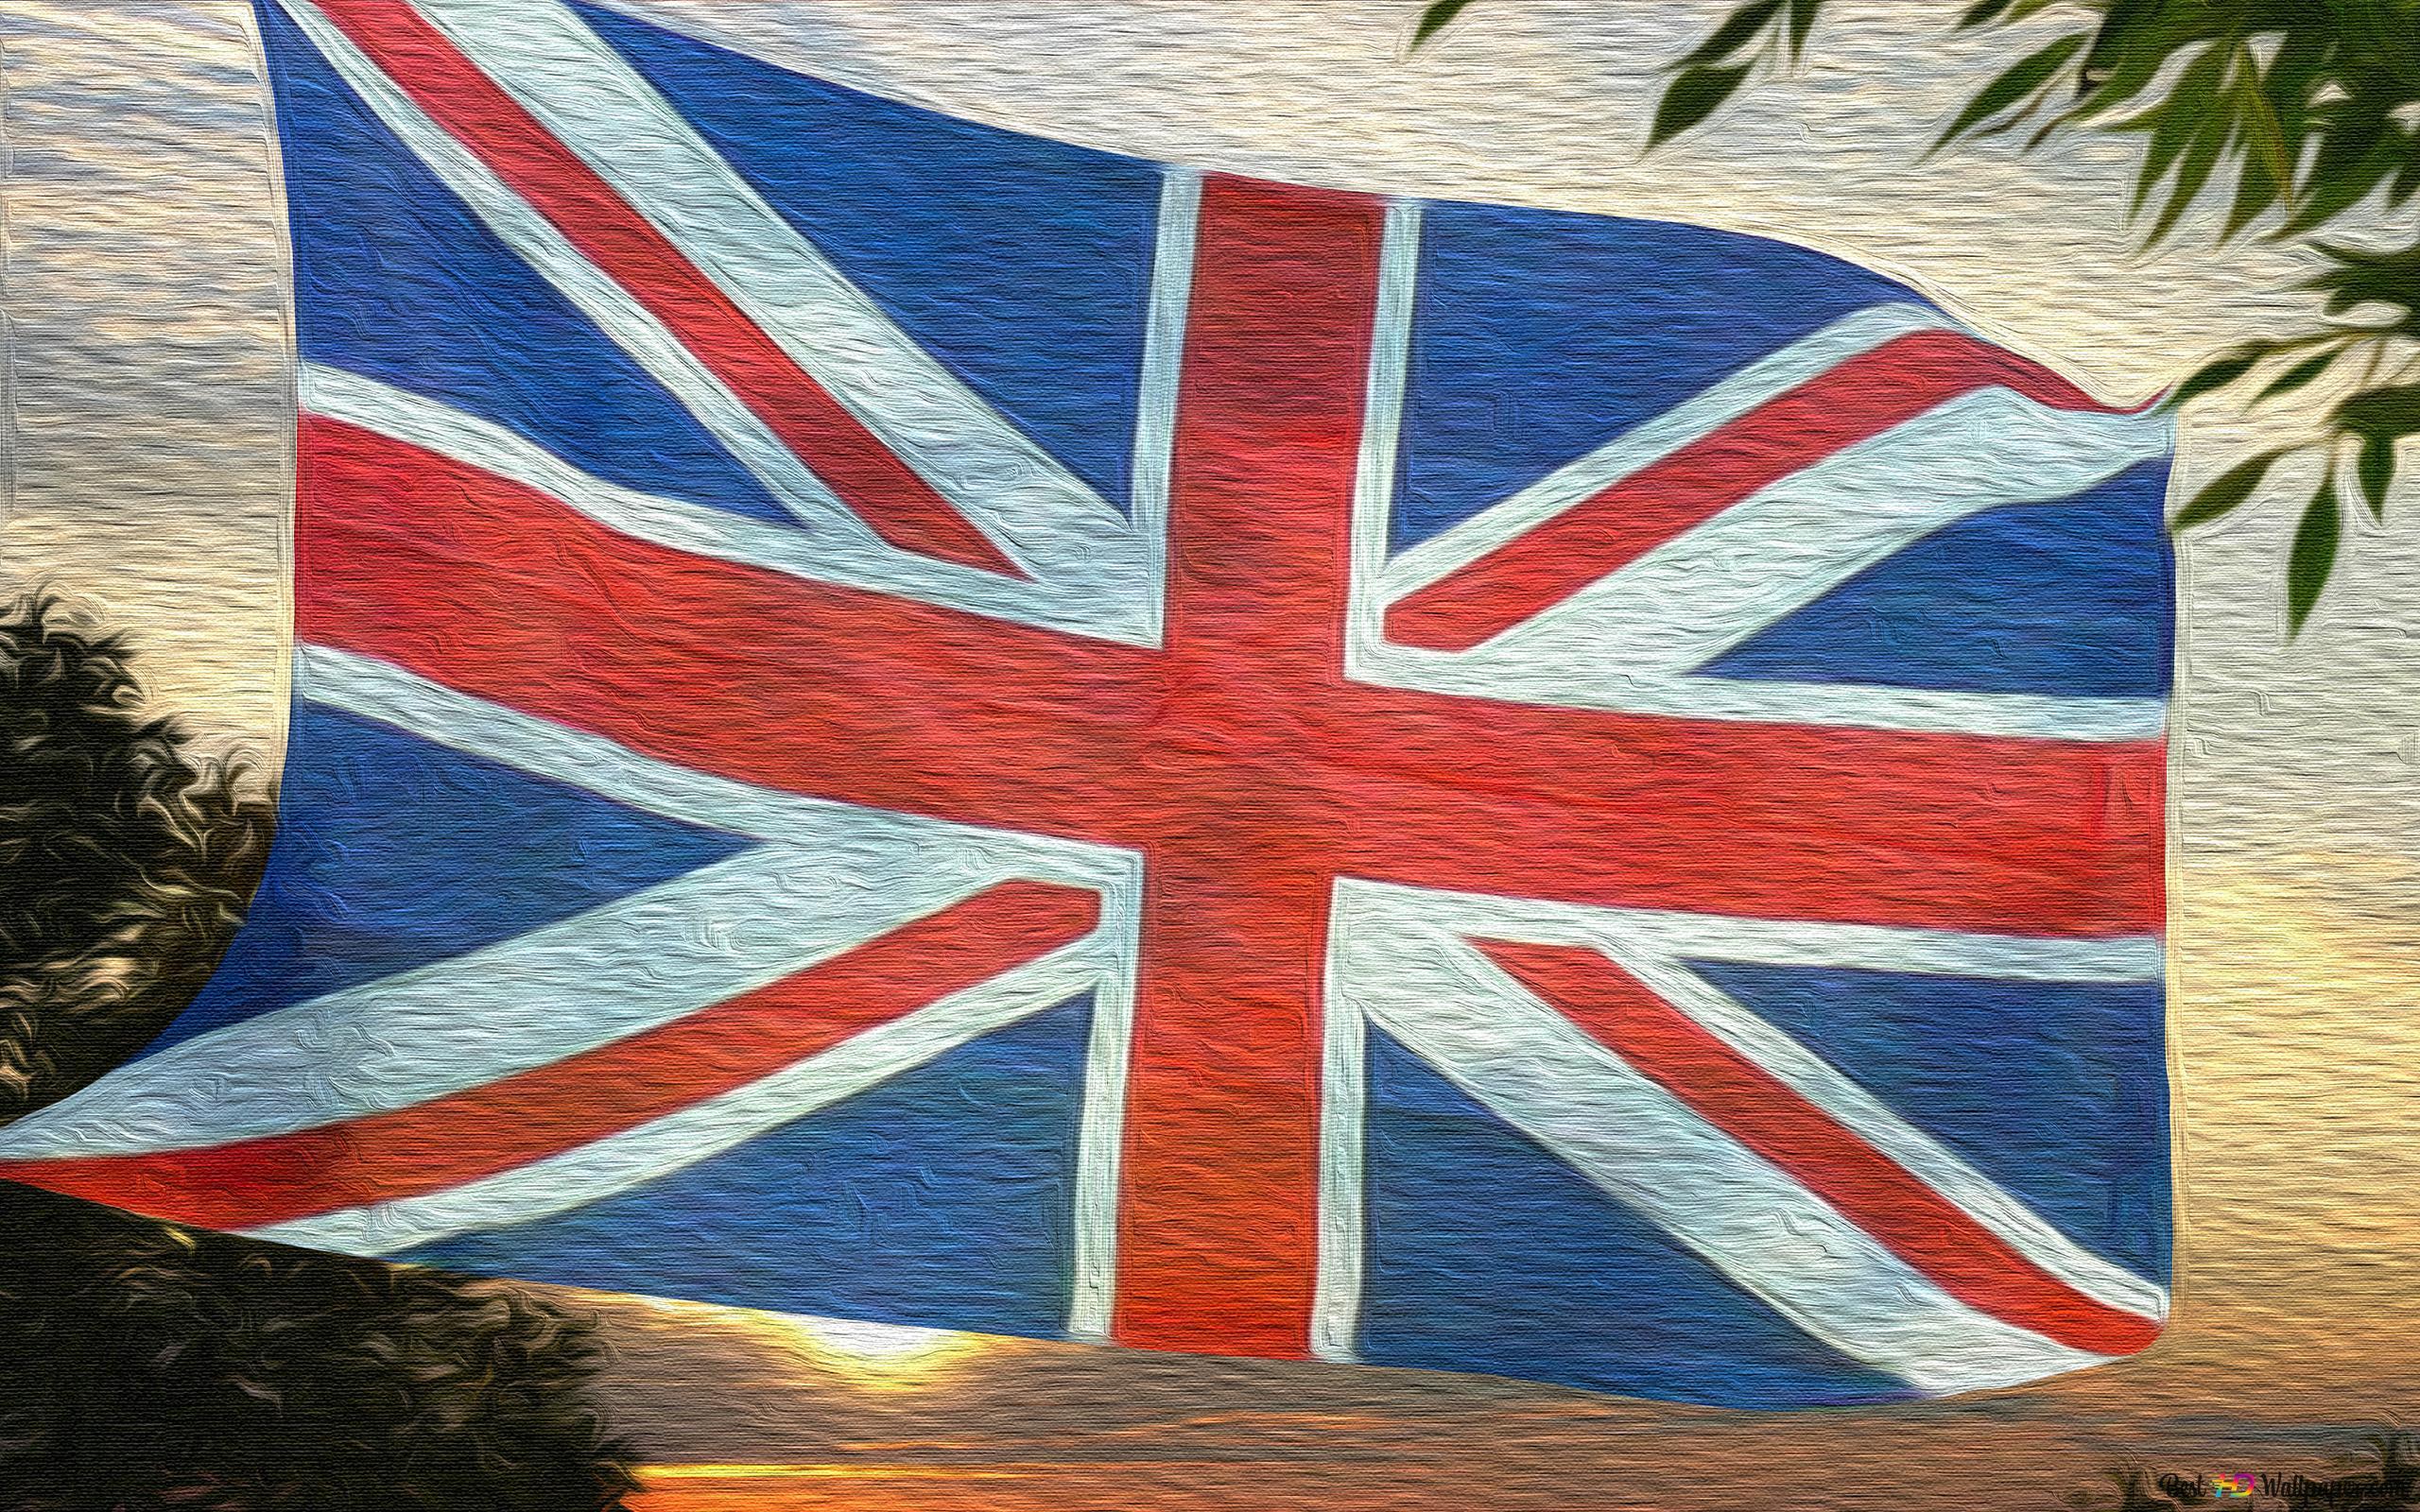 Union Jack Britse Vlag Hd Wallpaper Downloaden